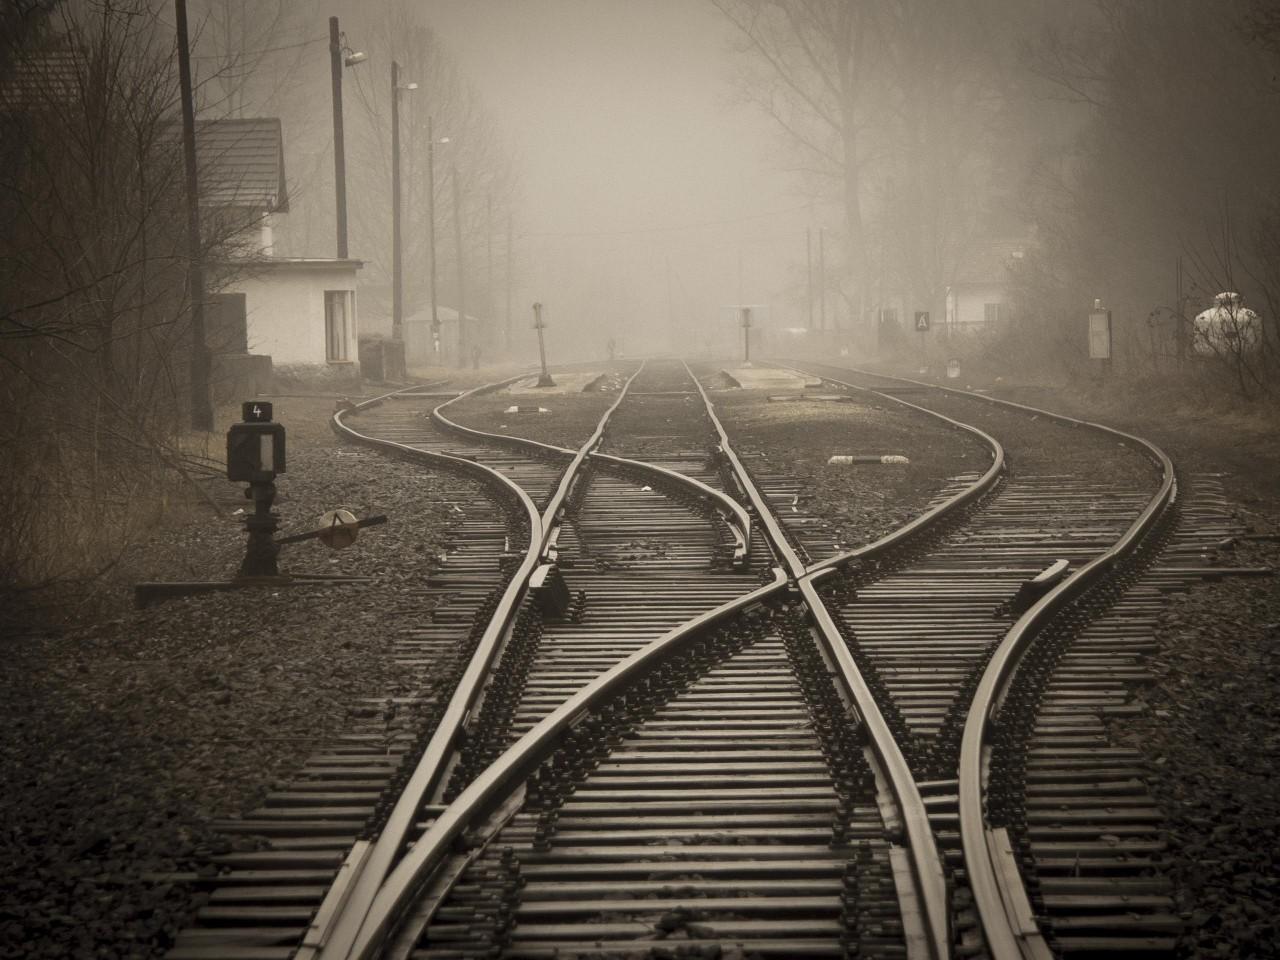 Stainless Steel Railway Track